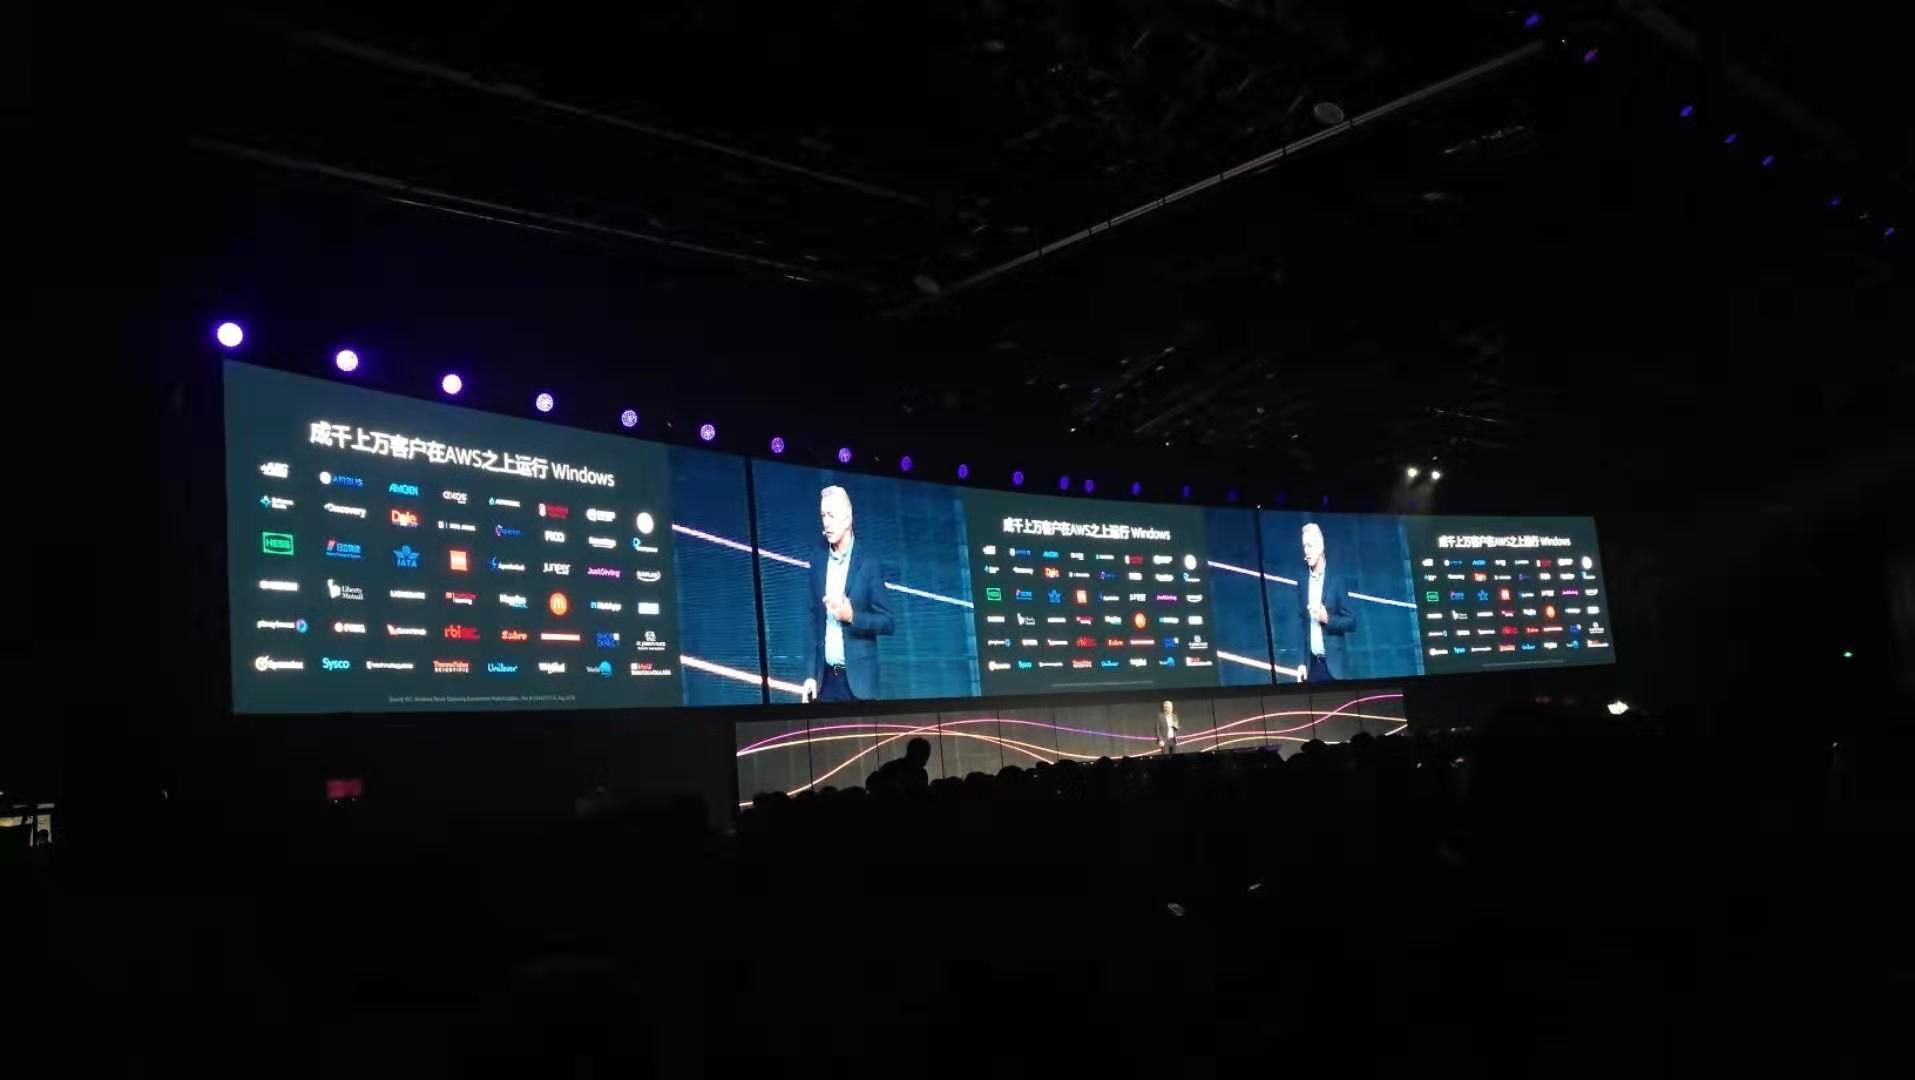 【ToB快讯】AWS技术峰会在北京举行,揭示云计算新趋势